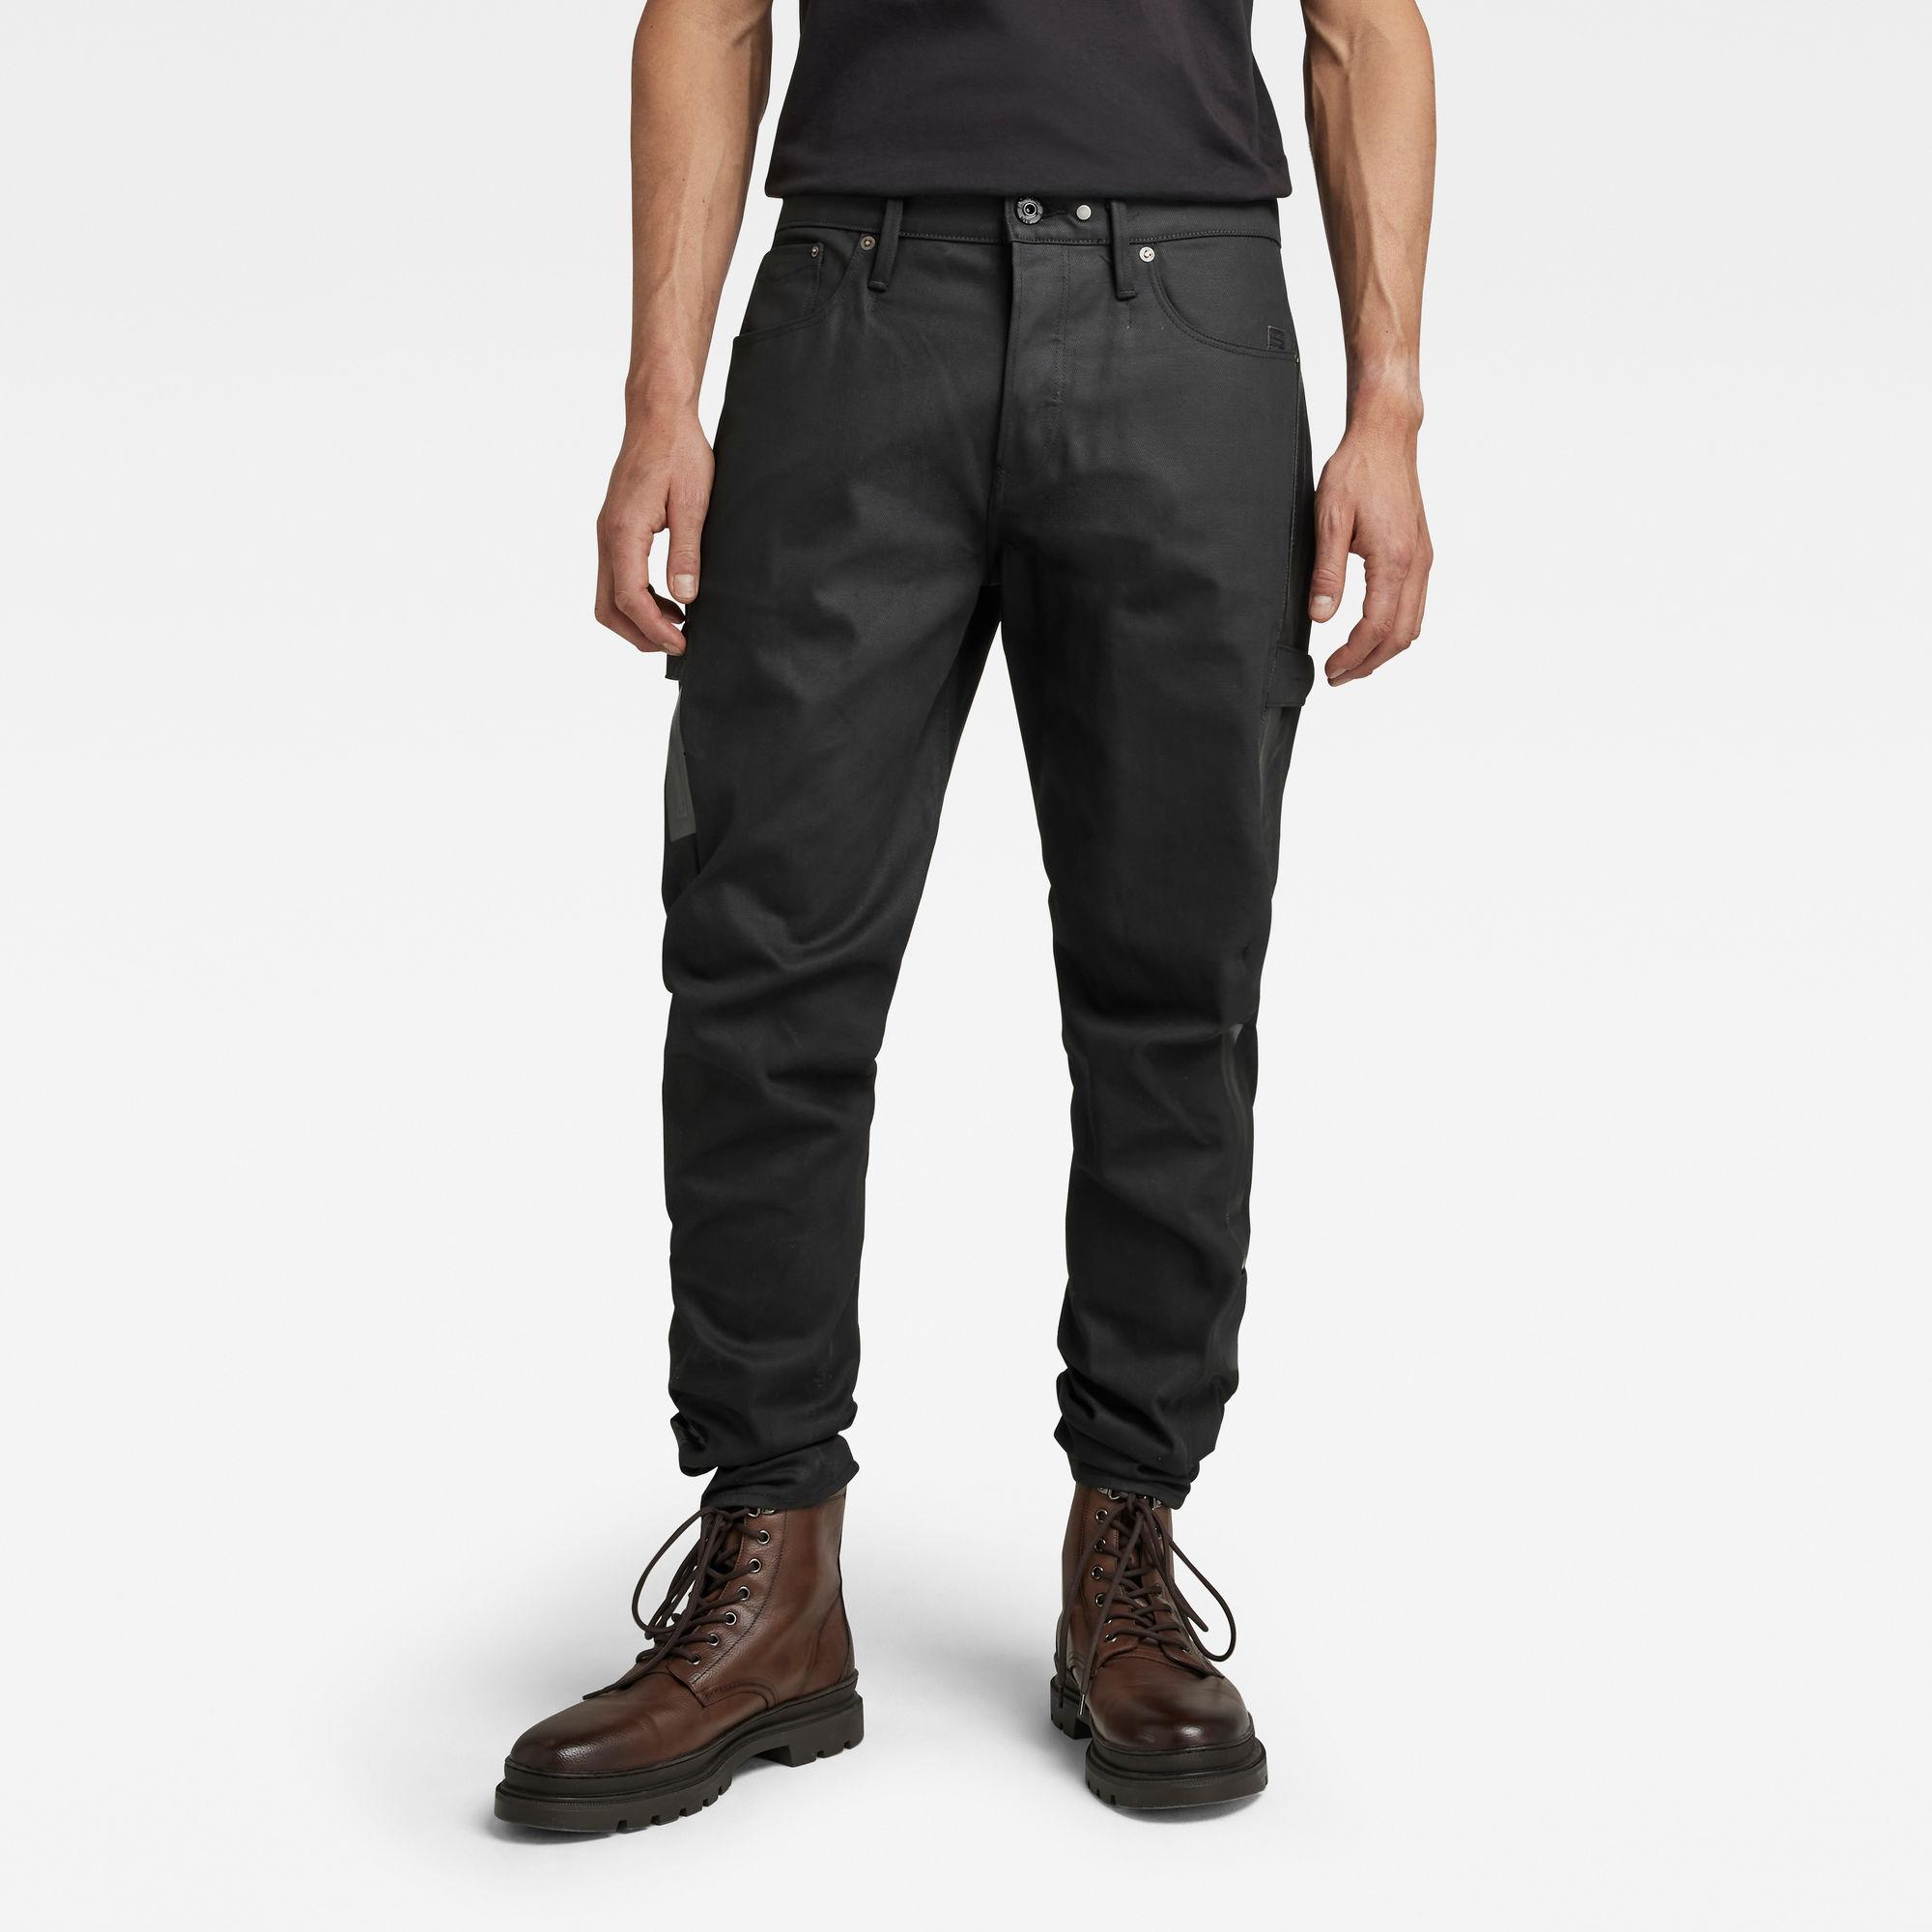 G-Star RAW Heren Scutar 3D Tapered Jeans CT Zwart